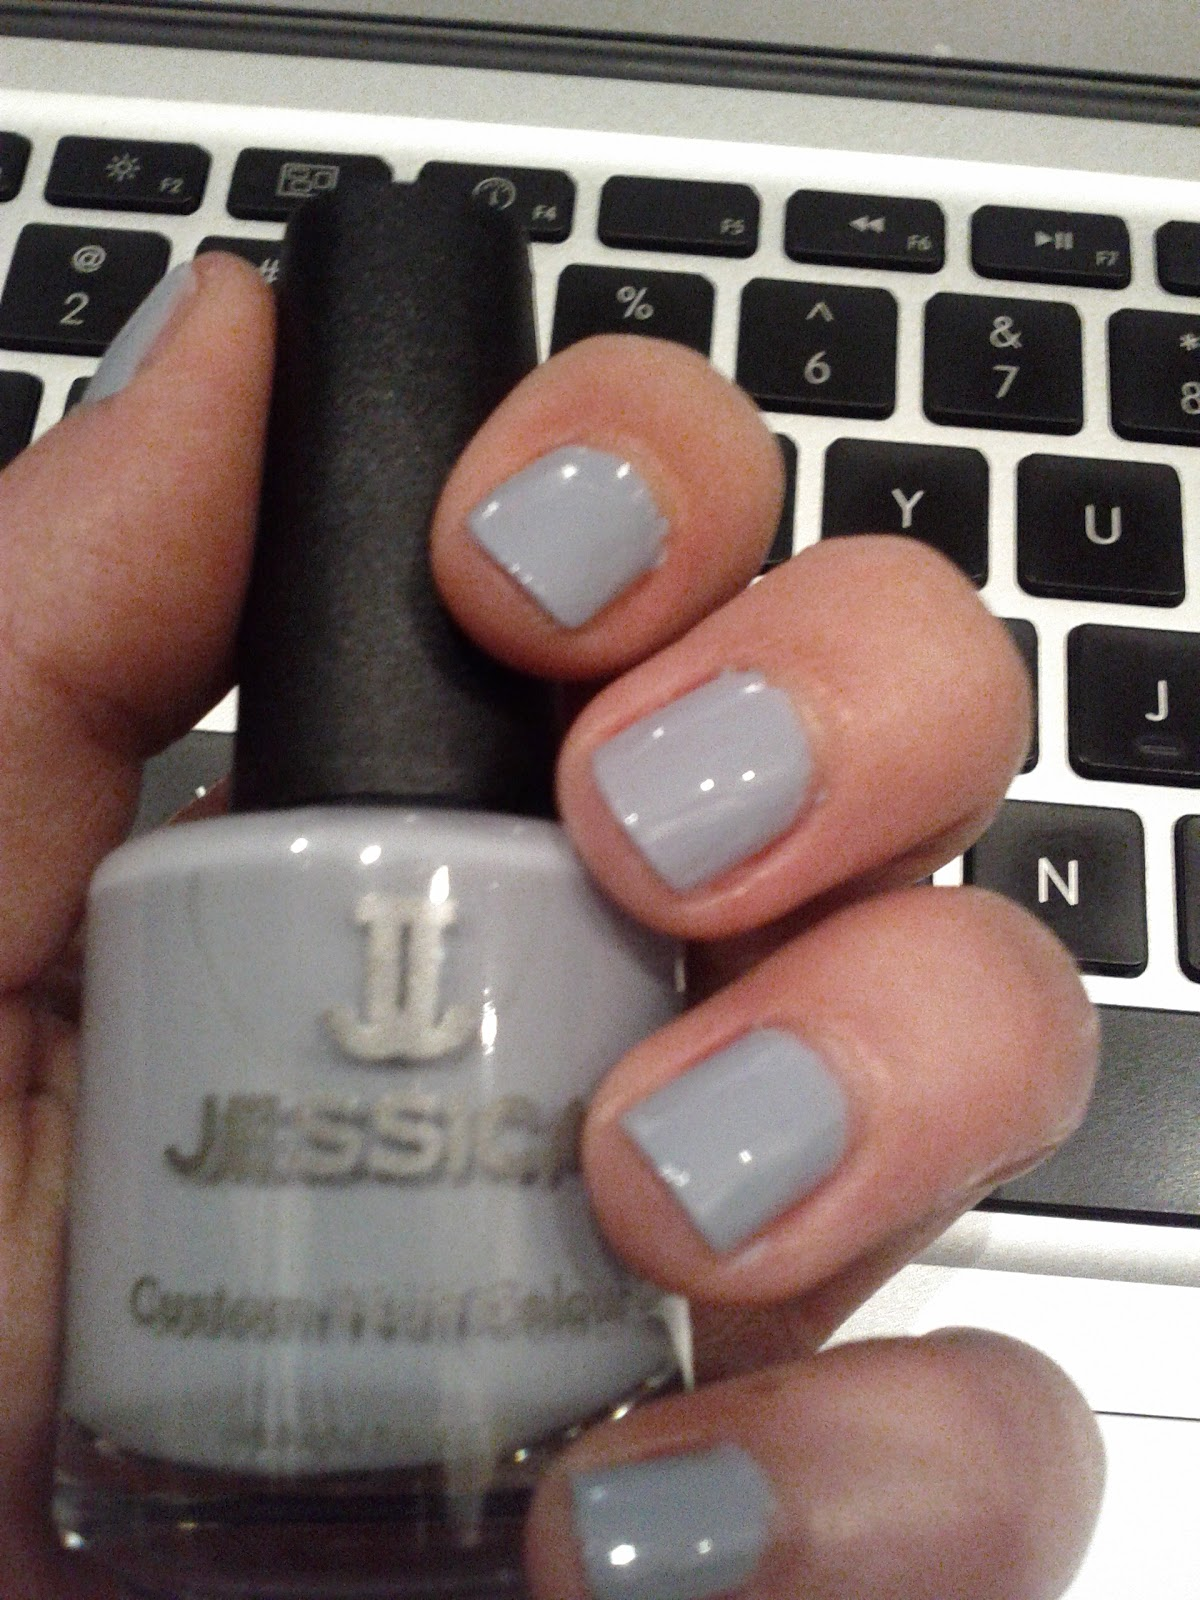 Lipgloss Break: Jessica nail polish in Sky High